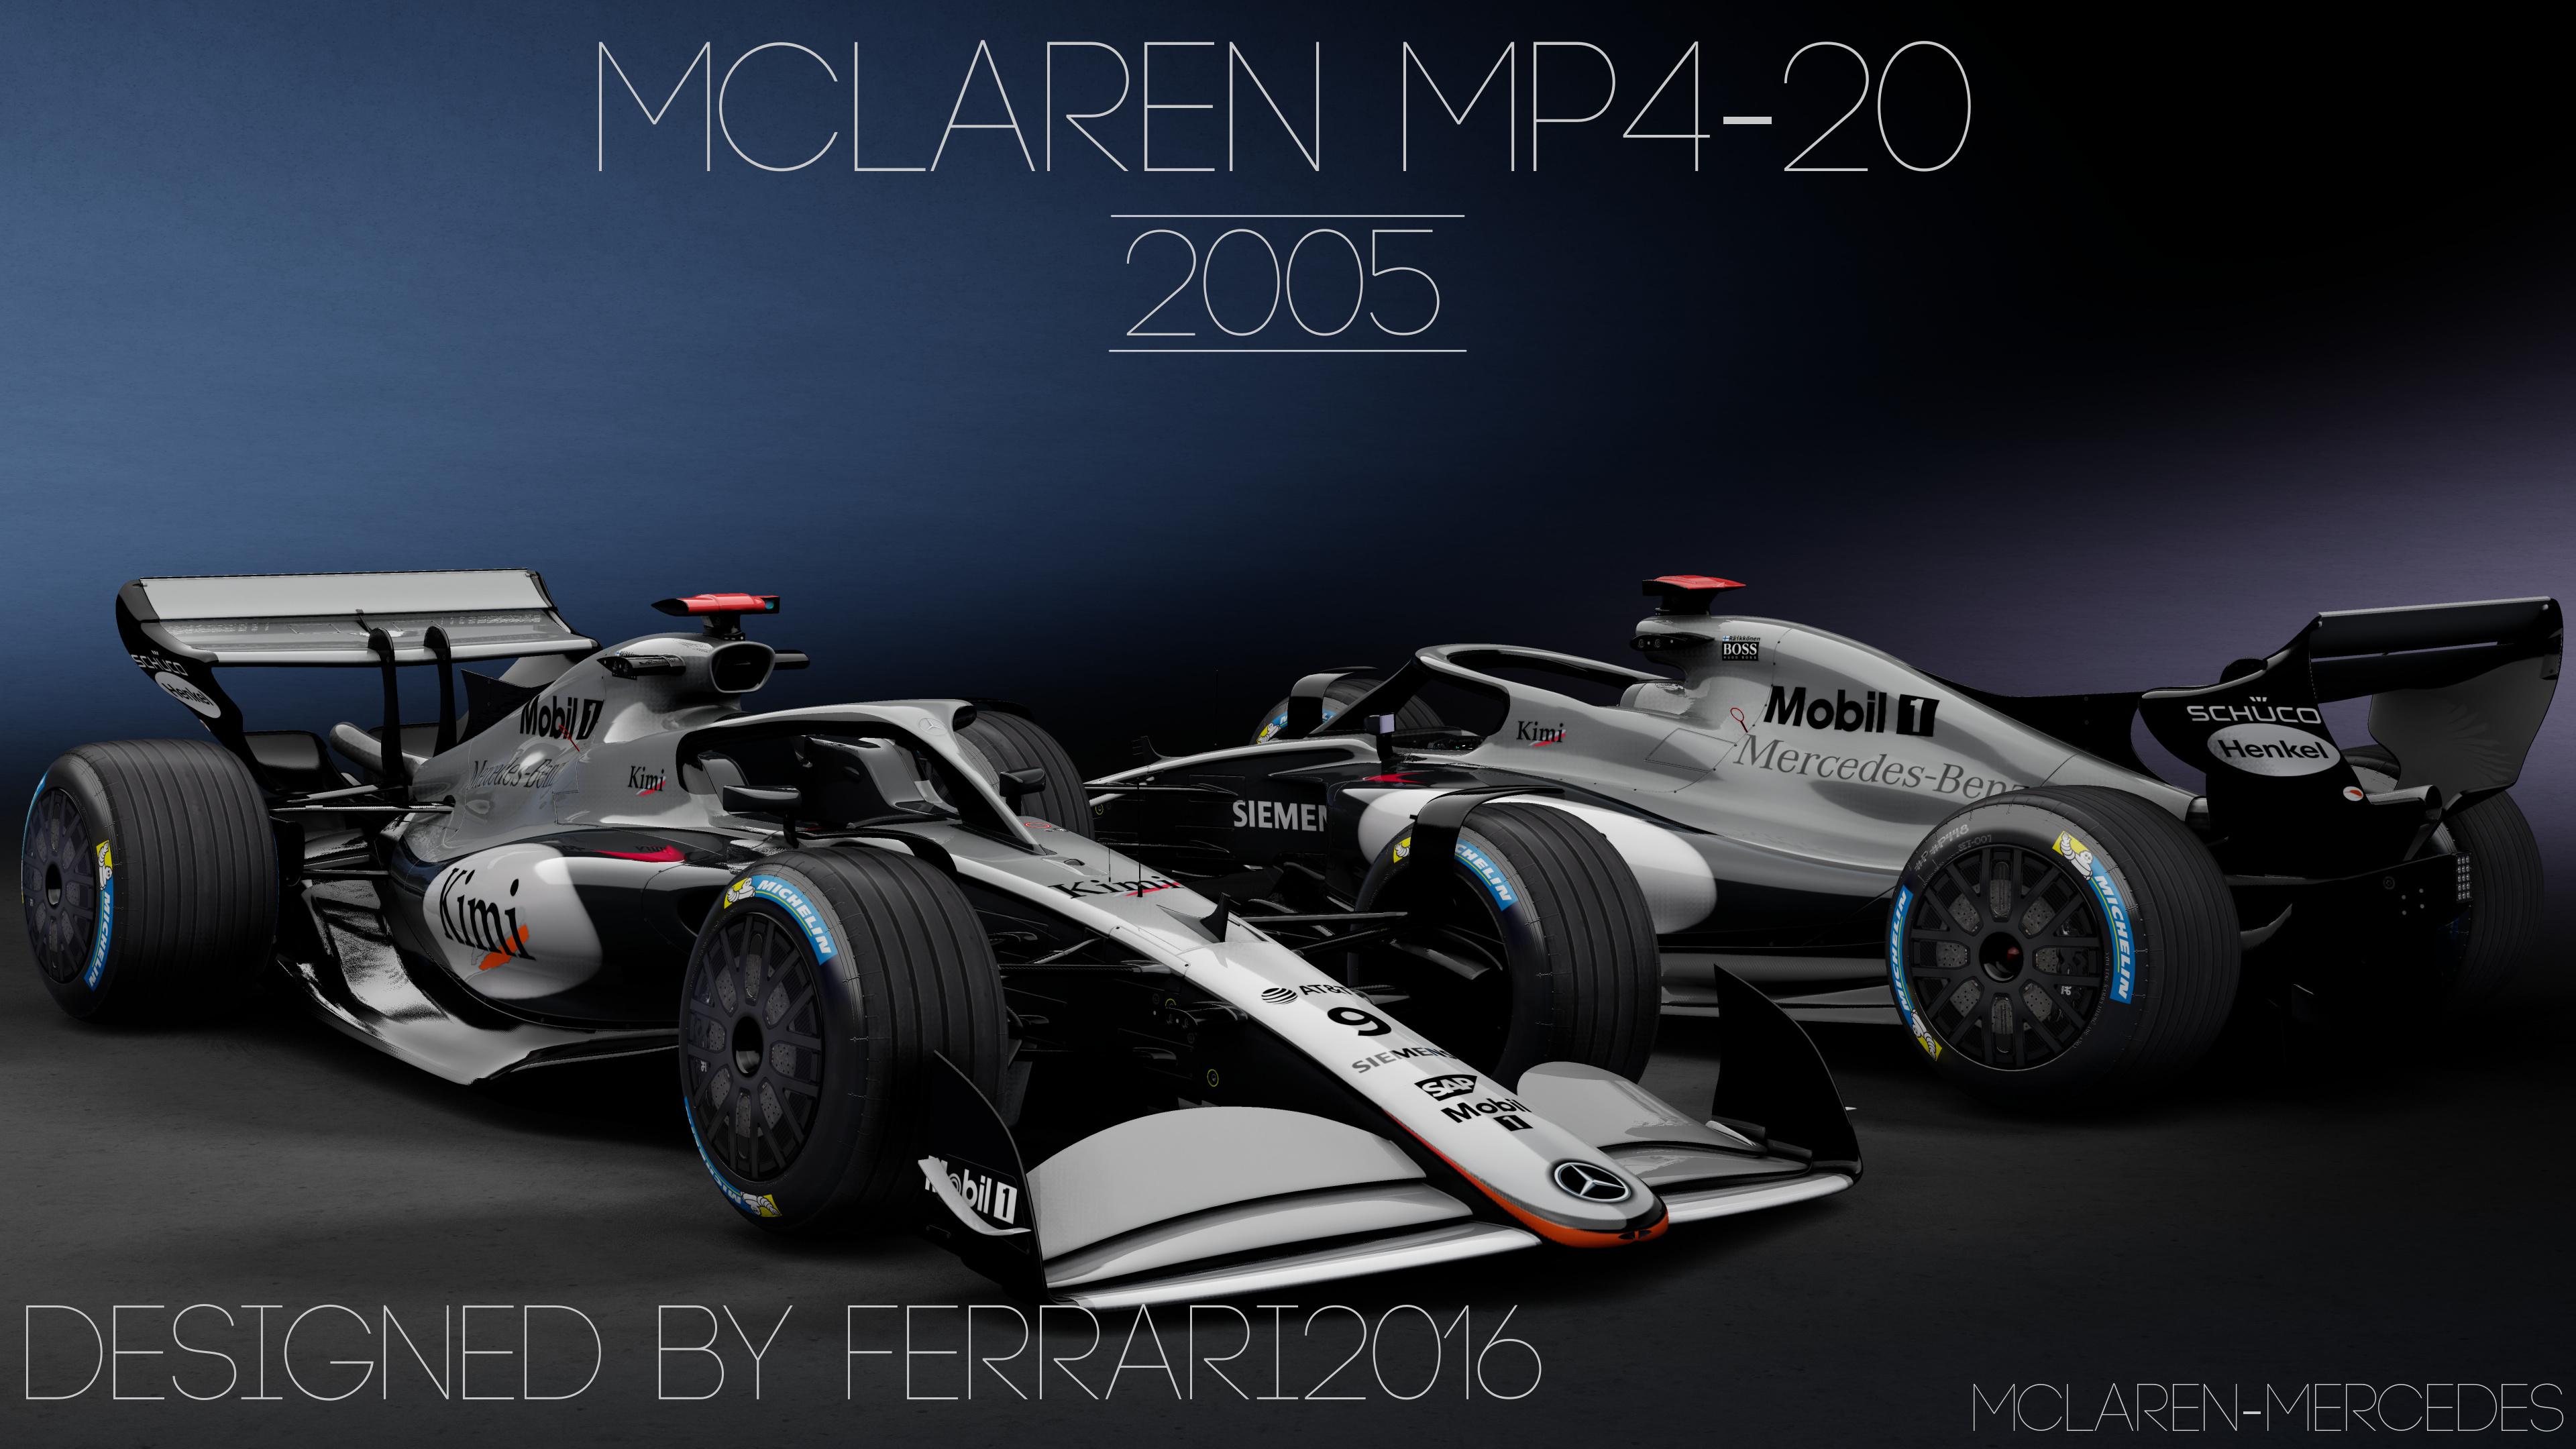 Mclaren Mercedes.jpg